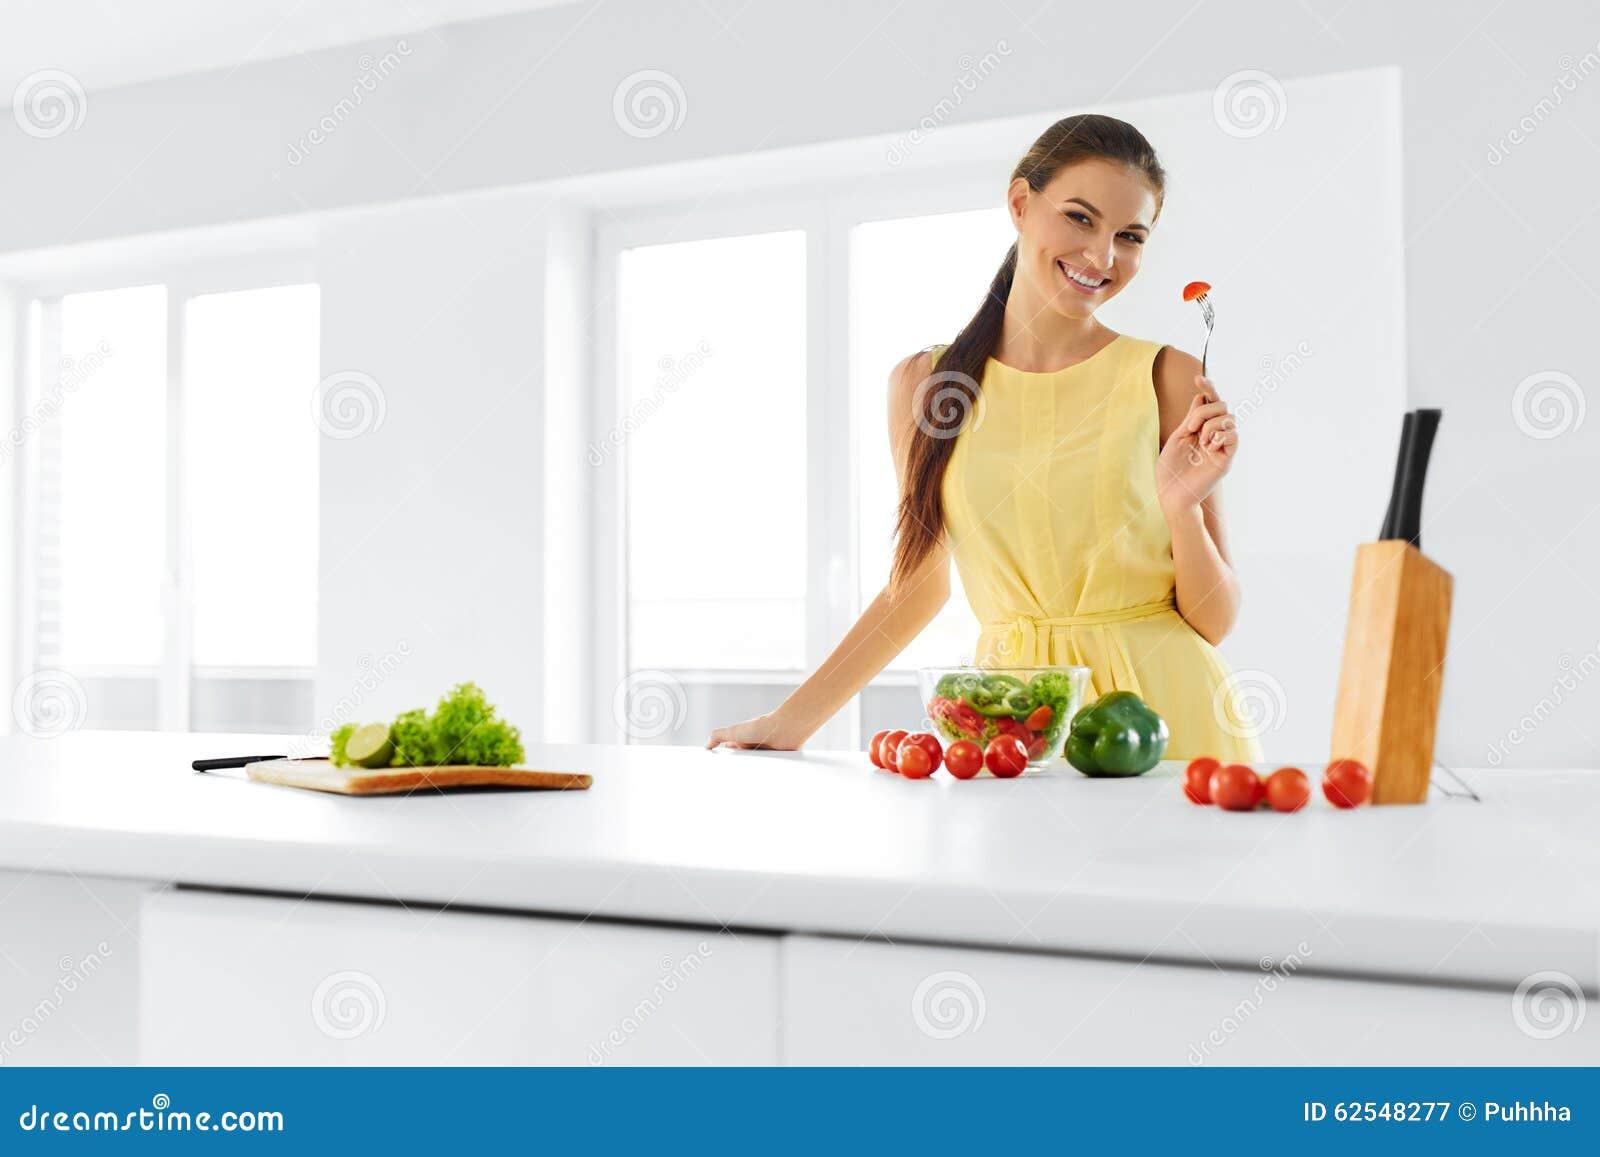 Organic food lifestyle